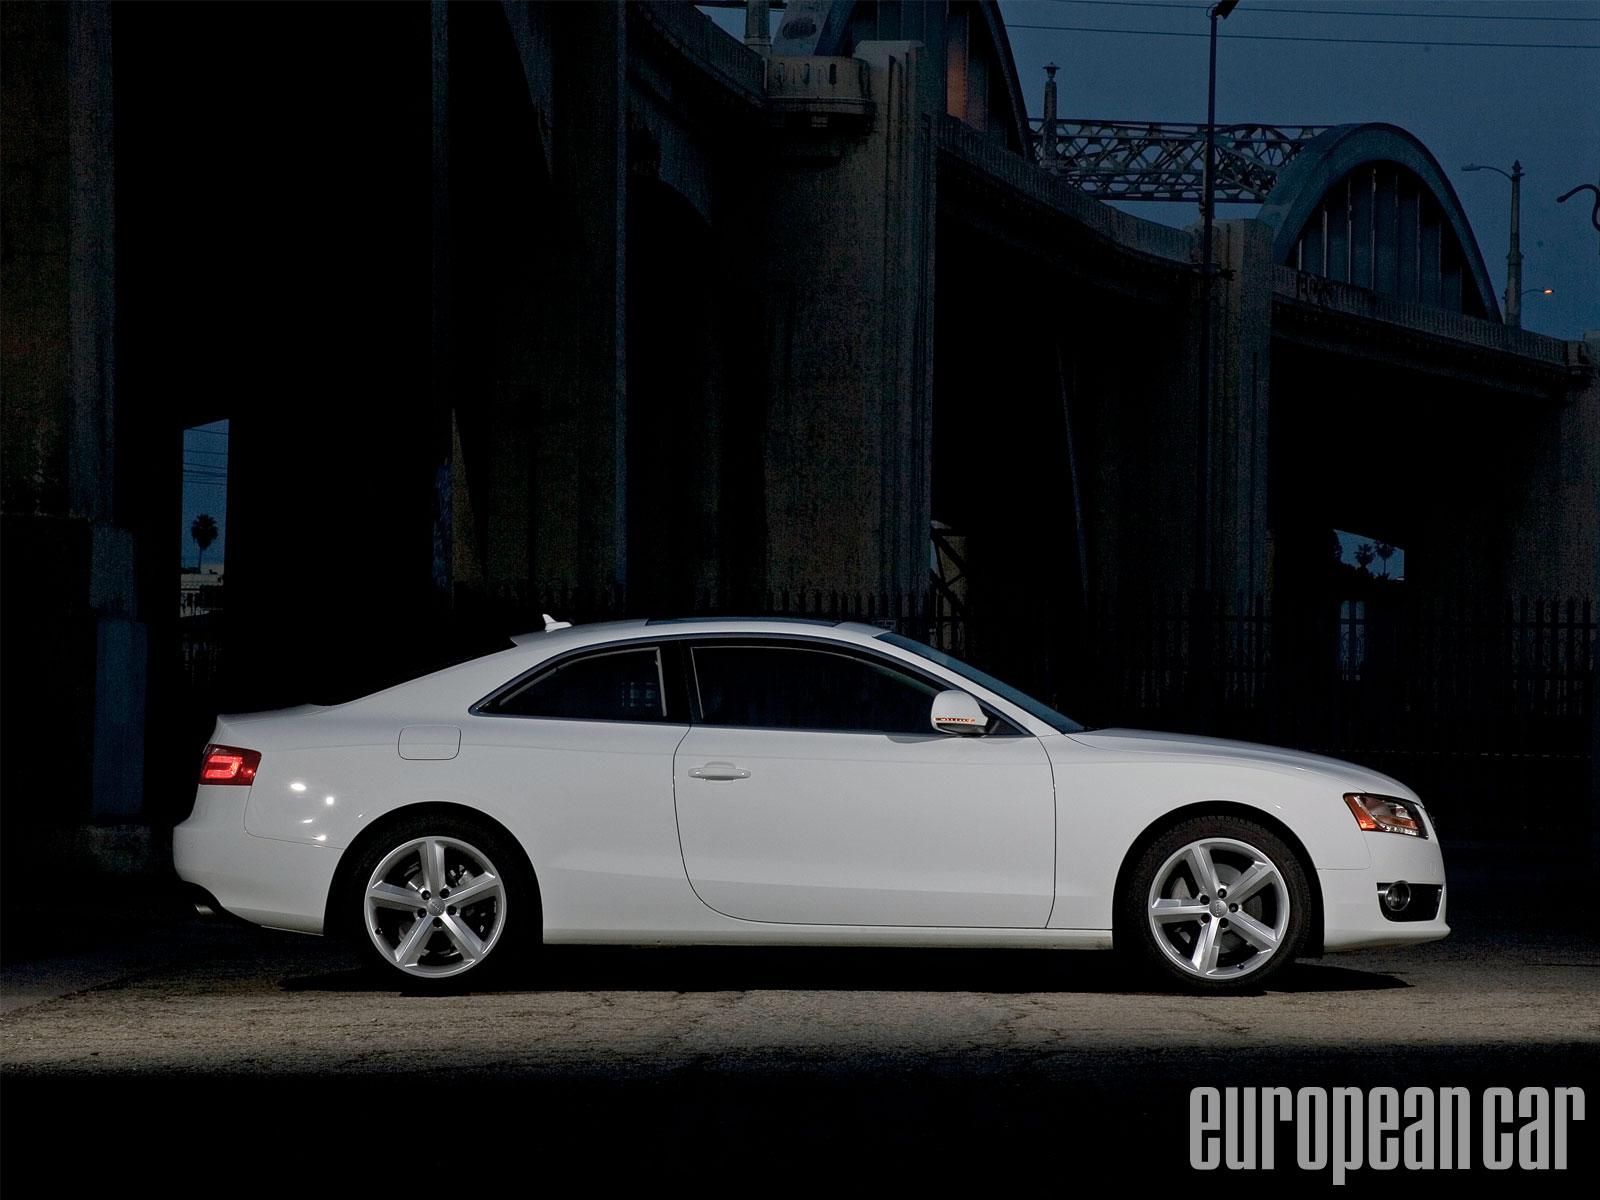 2009 Audi A5 Image 8